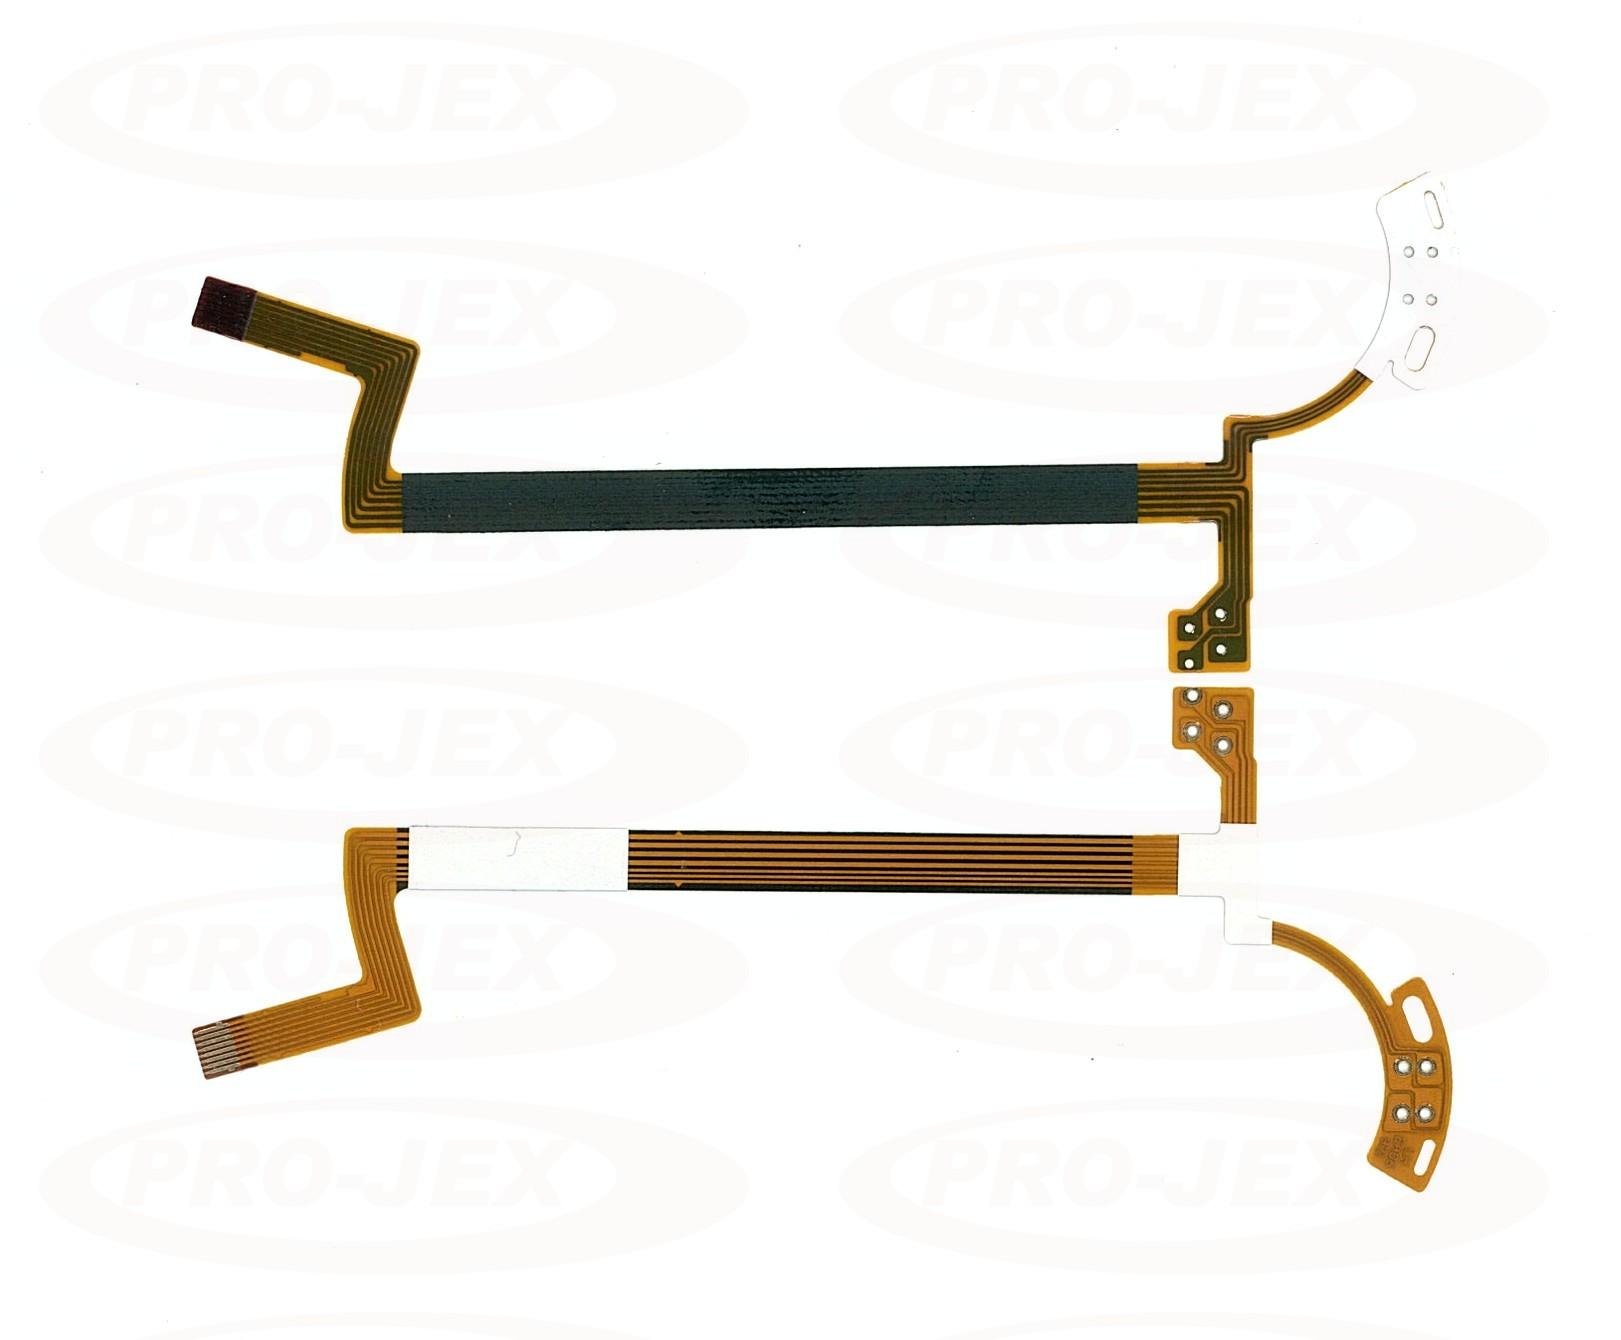 Flex TAMRON 18-200 3.5-6.3 mocowanie CANON